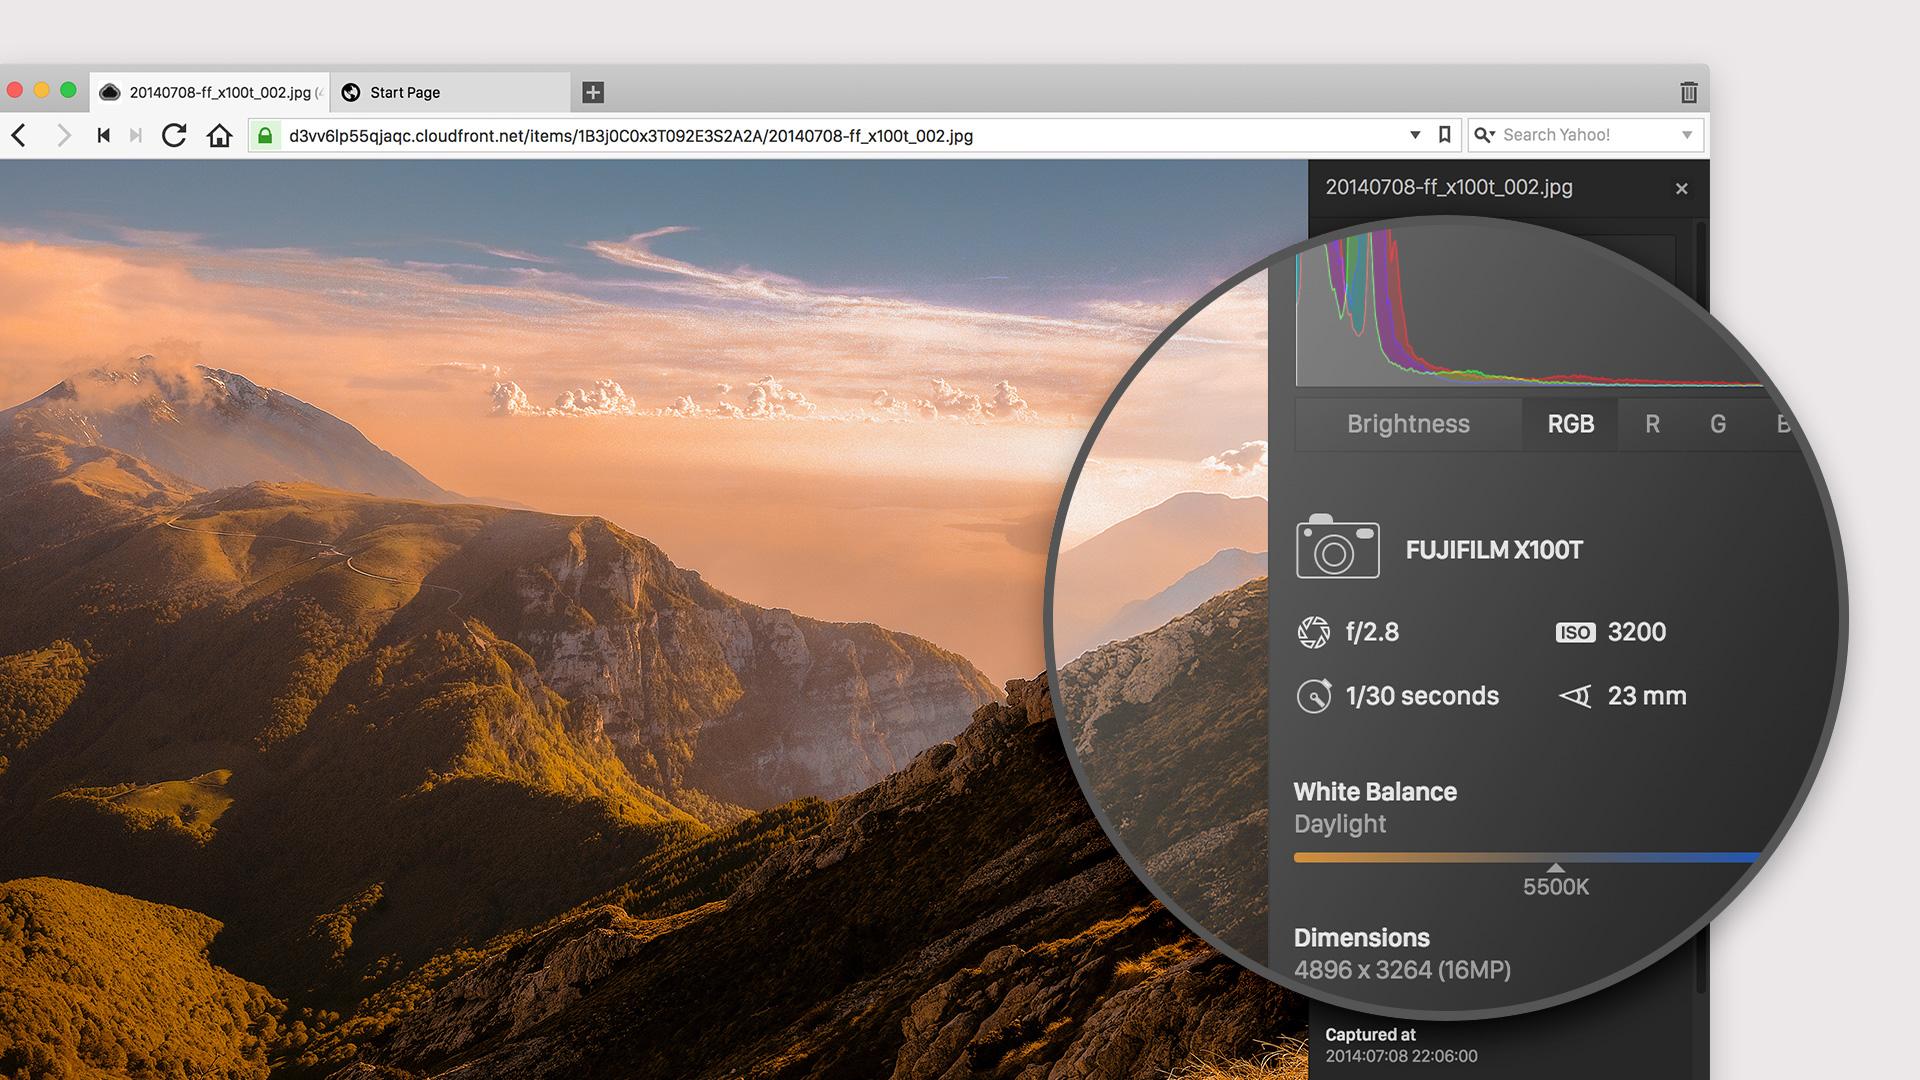 Image Properties tool in Vivaldi browser